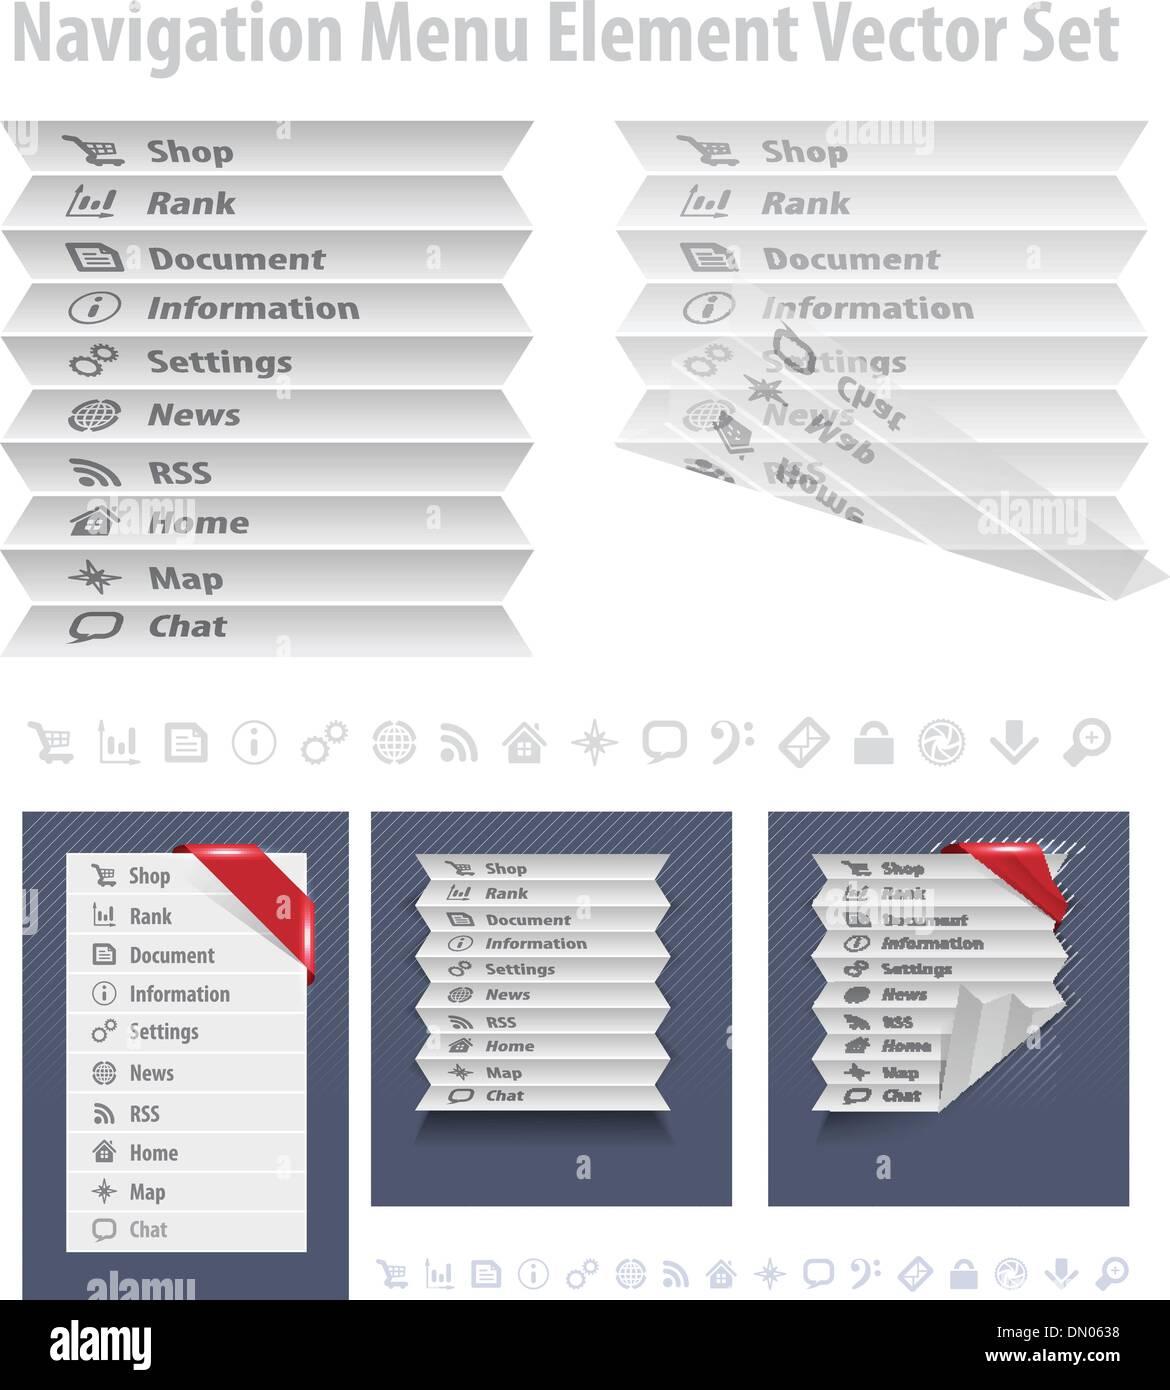 Folded navigation menu - Stock Image